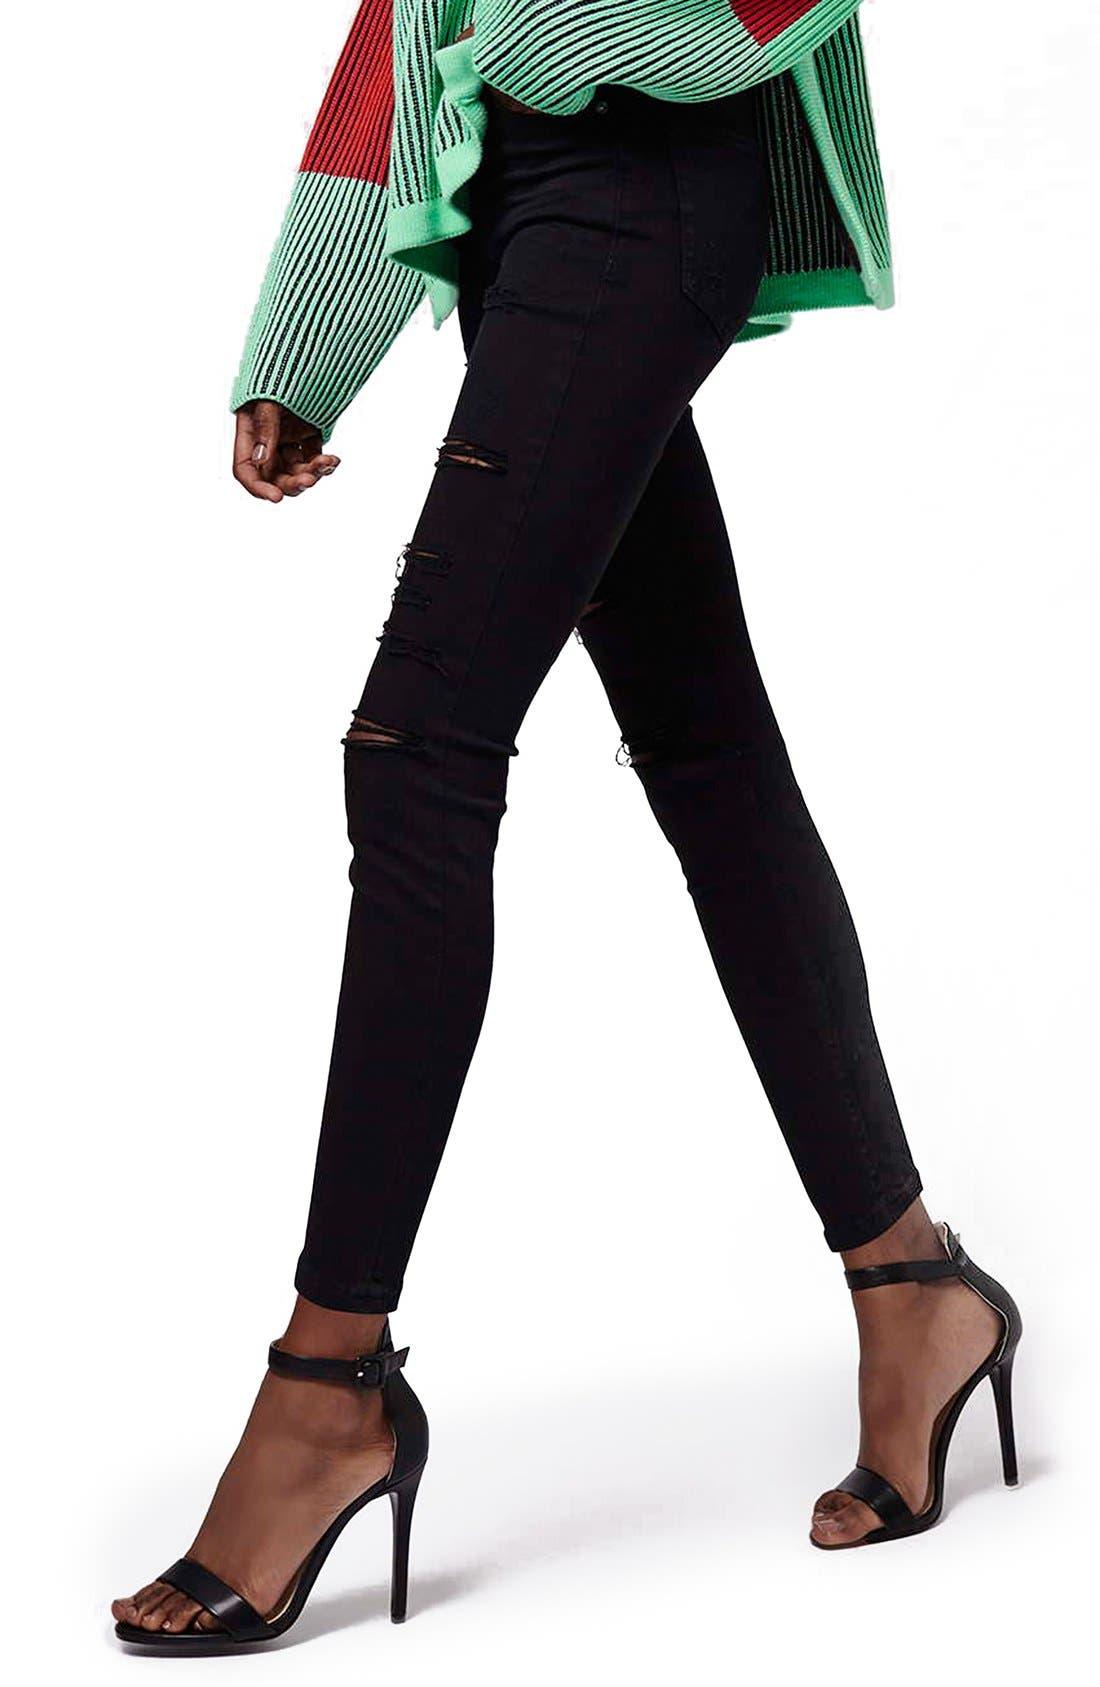 Alternate Image 1 Selected - Topshop Moto 'Jamie' Ripped Skinny Jeans (Black) (Petite)